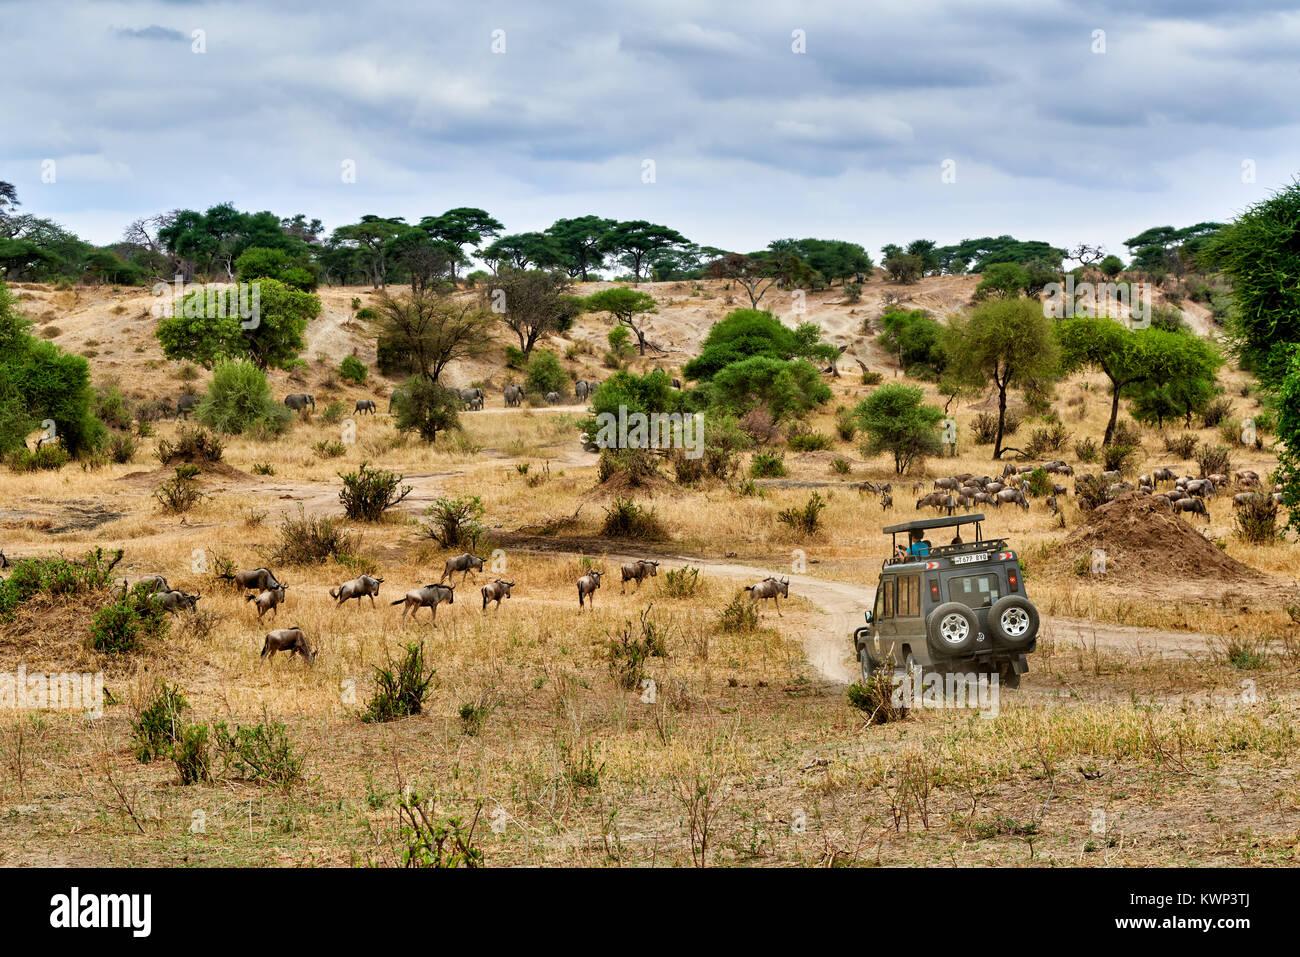 Blue Wildebeest und Safari Auto auf Tal der Tarangire Nationalpark, Tansania, Afrika Stockbild